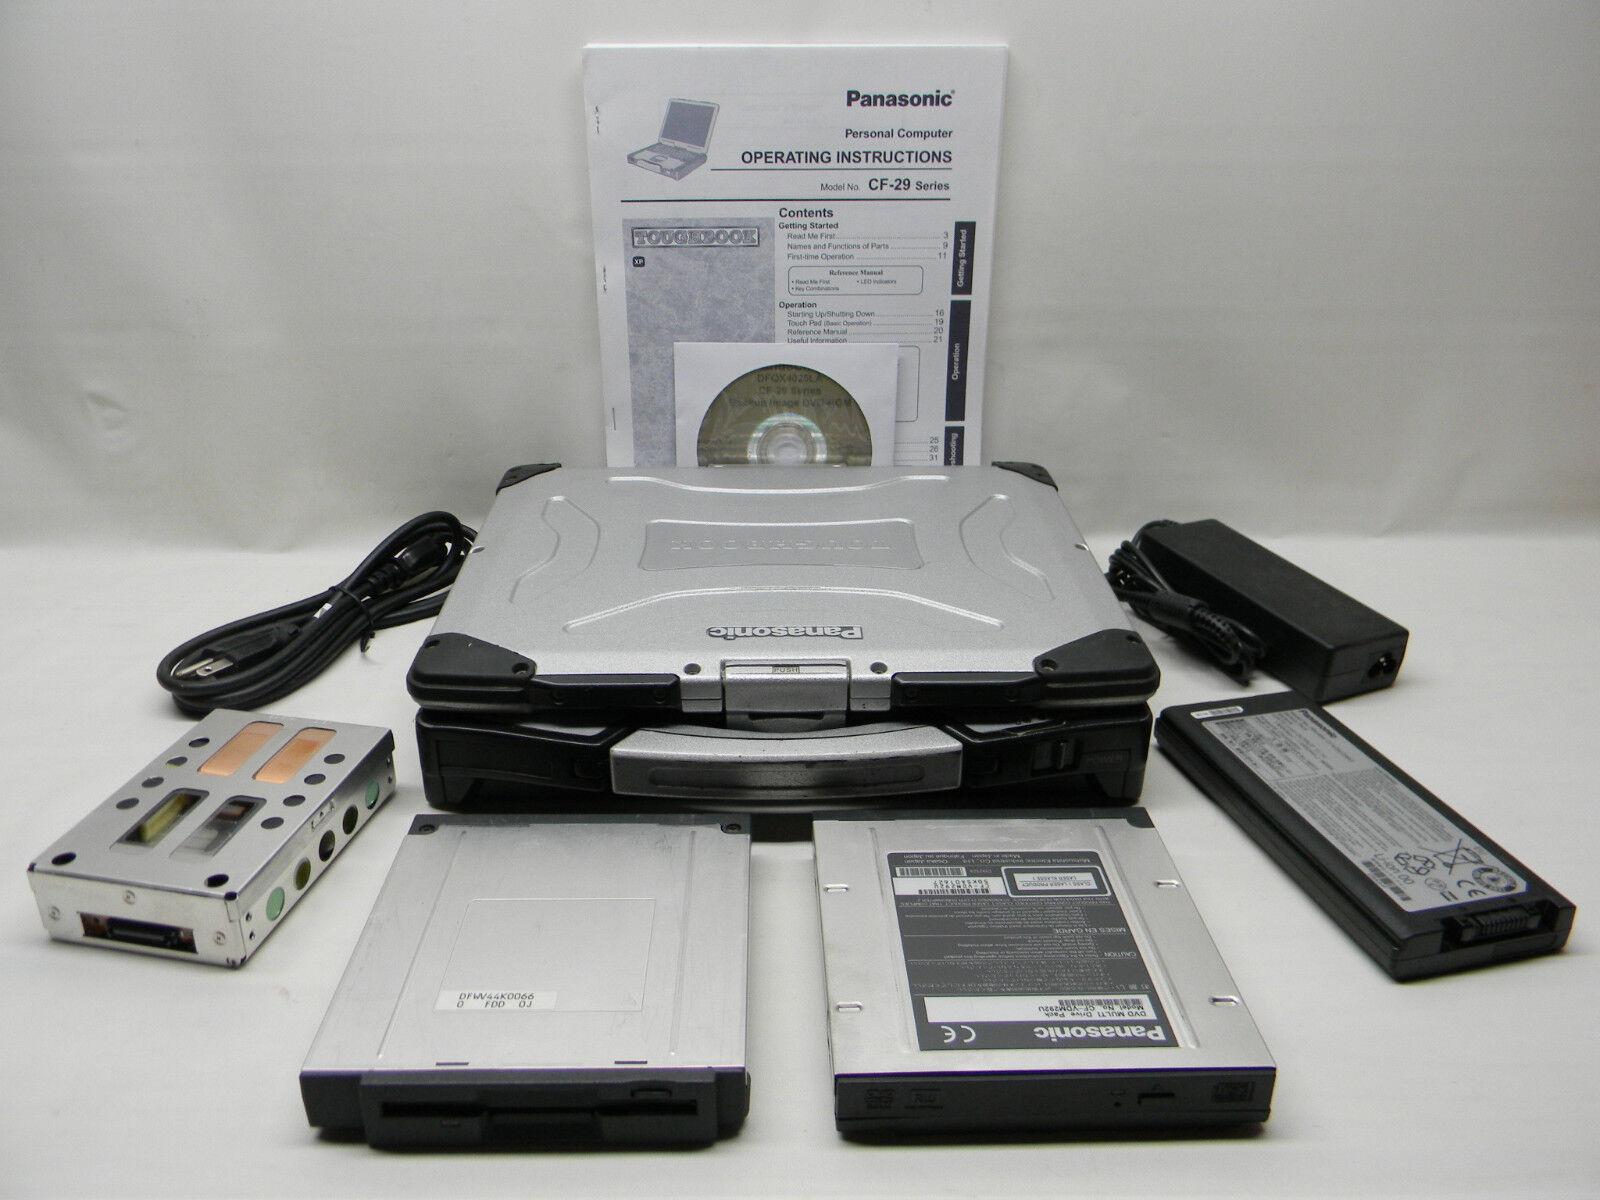 Panasonic CF-29 Toughbook Commercial/Industrial Laptop XP Pro #686